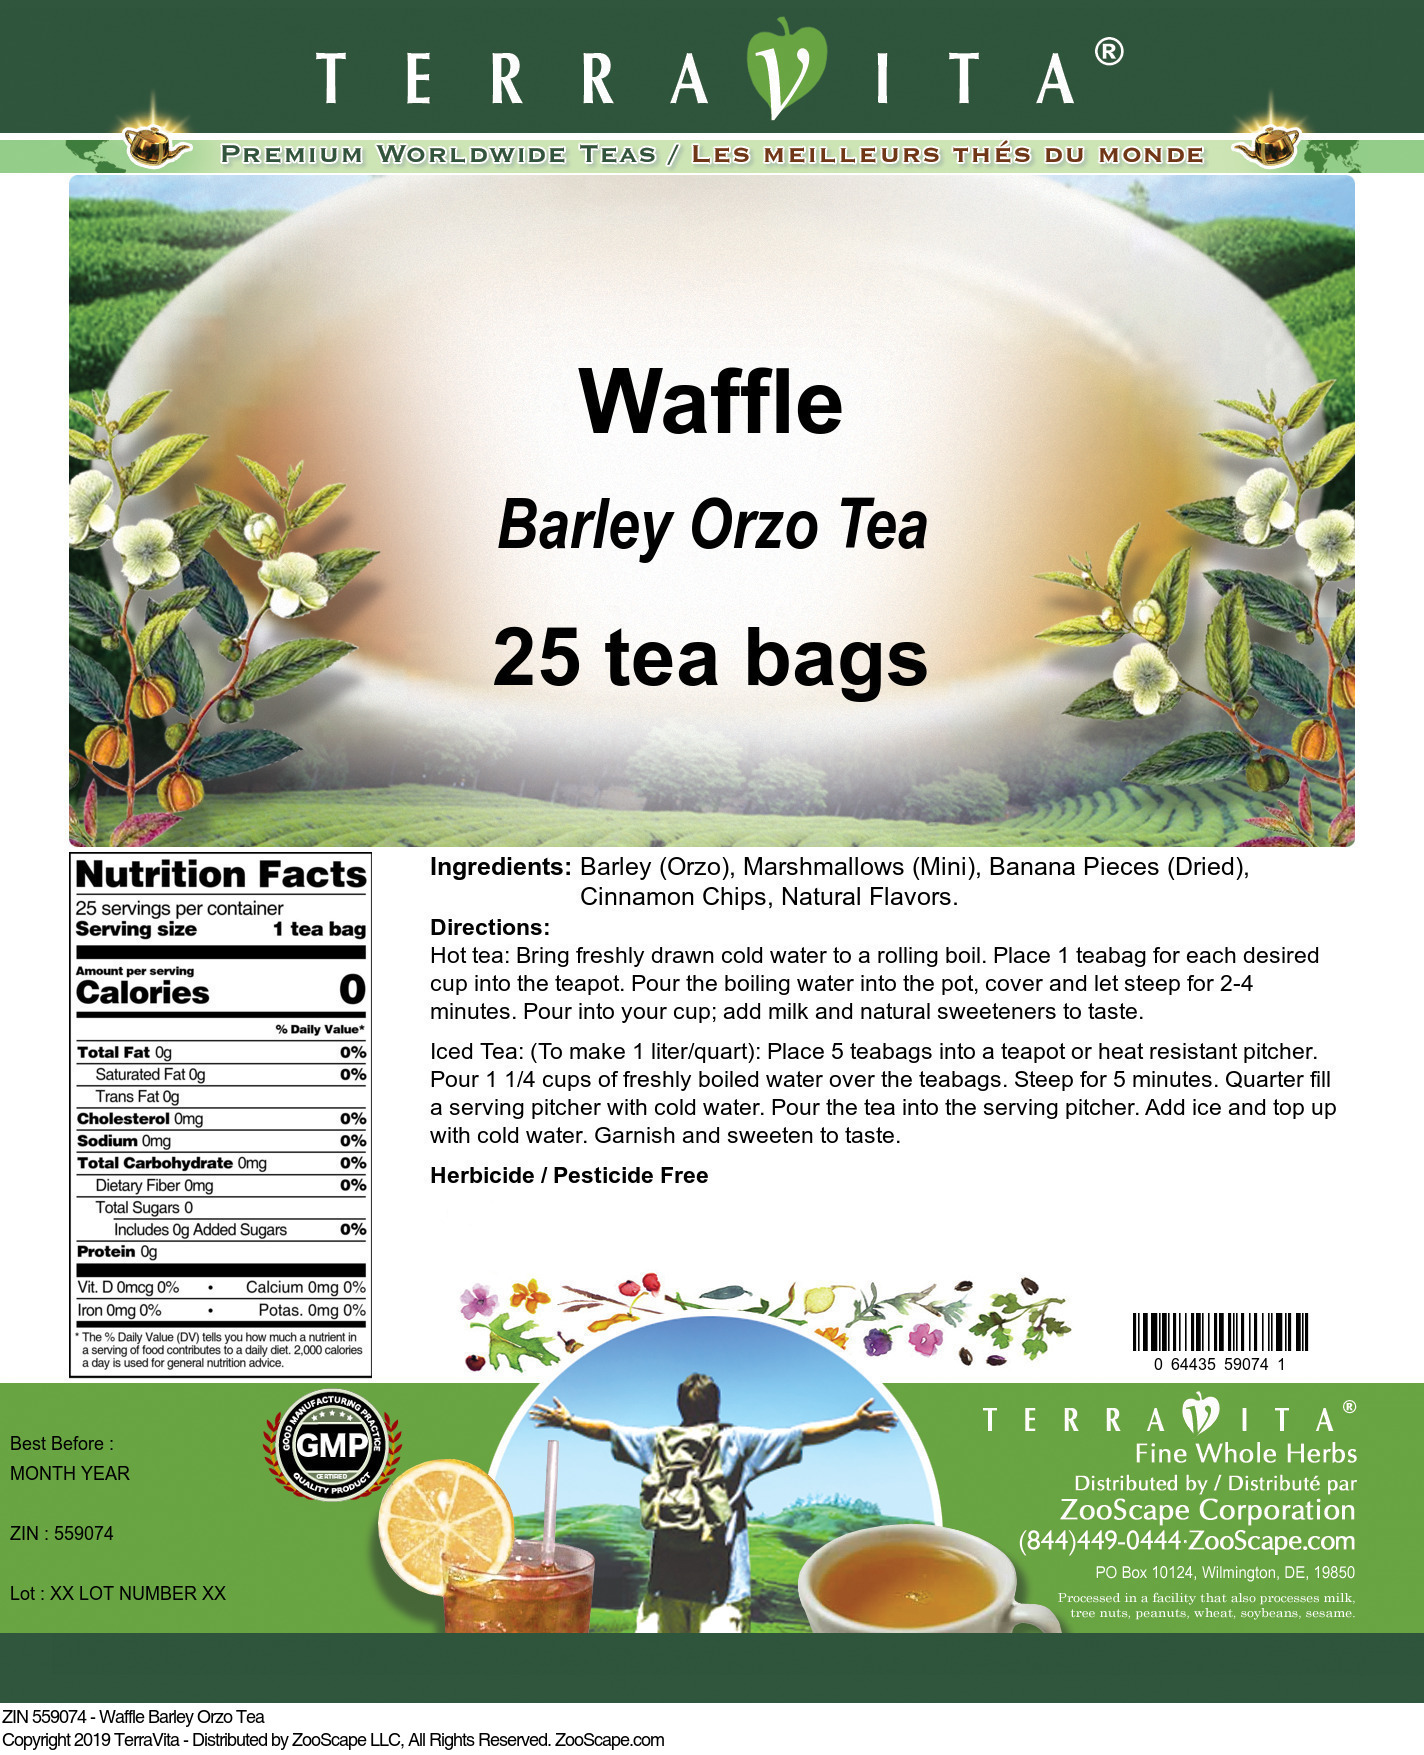 Waffle Barley Orzo